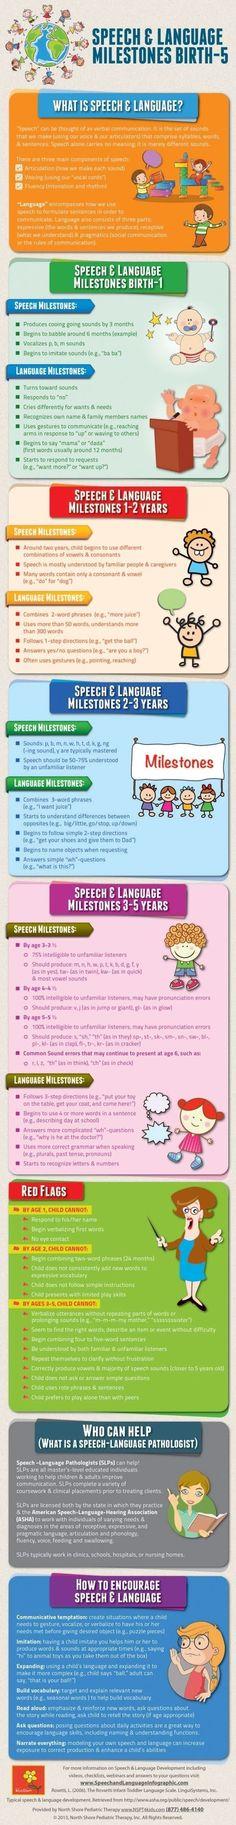 North Shore Pediatric Therapy. Speech and Language developmental milestones. speech language milestones birth to 1, speech language milestones 2 years, speech language milestones 3-5, red flags, early intervention